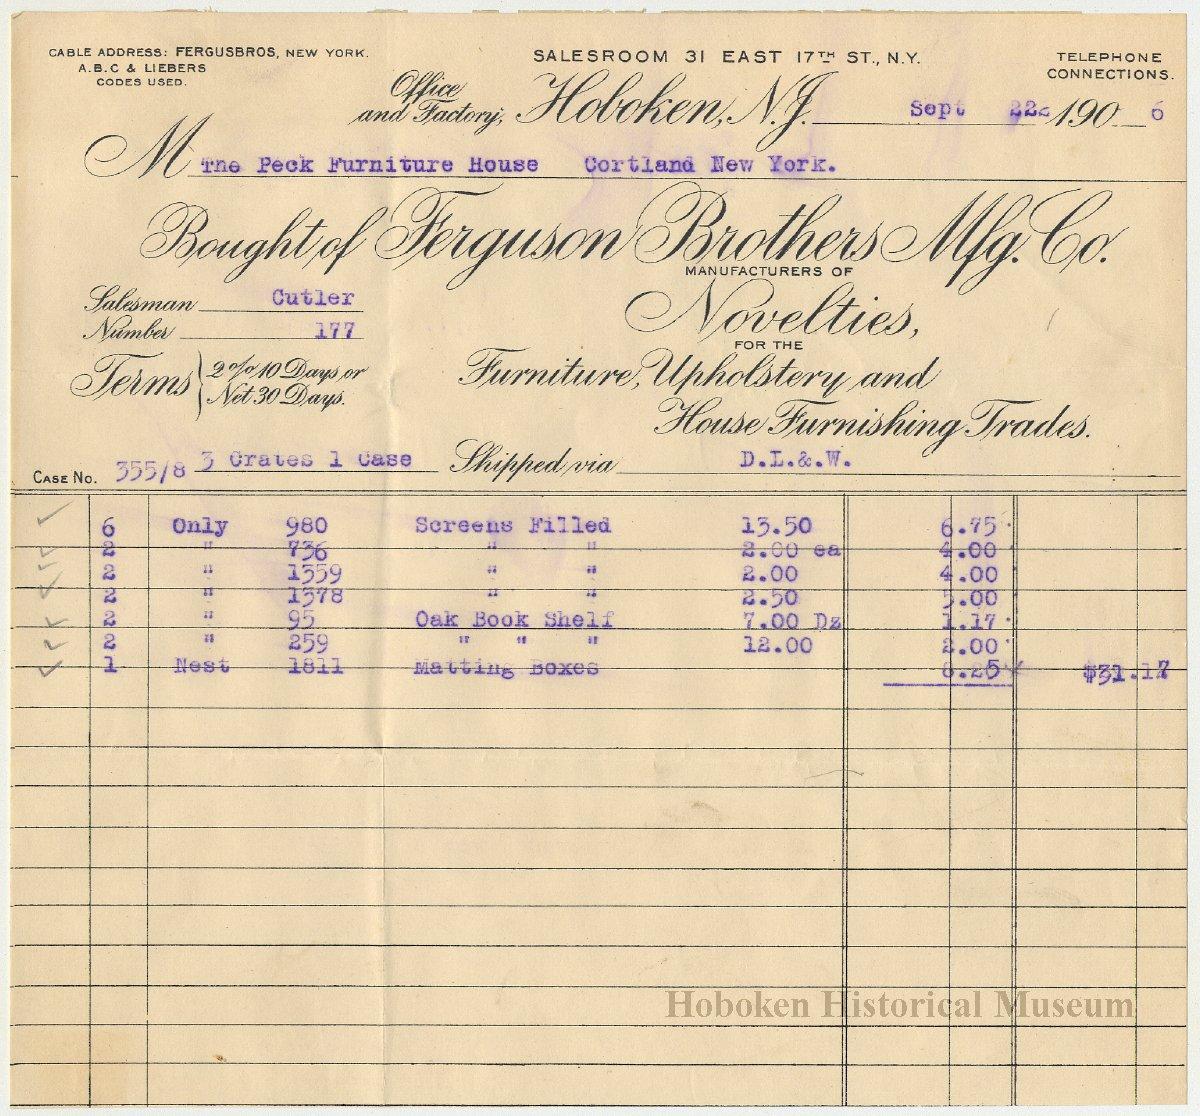 Image Of Bill: Ferguson Brothers Mfg. Co., Office U0026 Factory, Hoboken